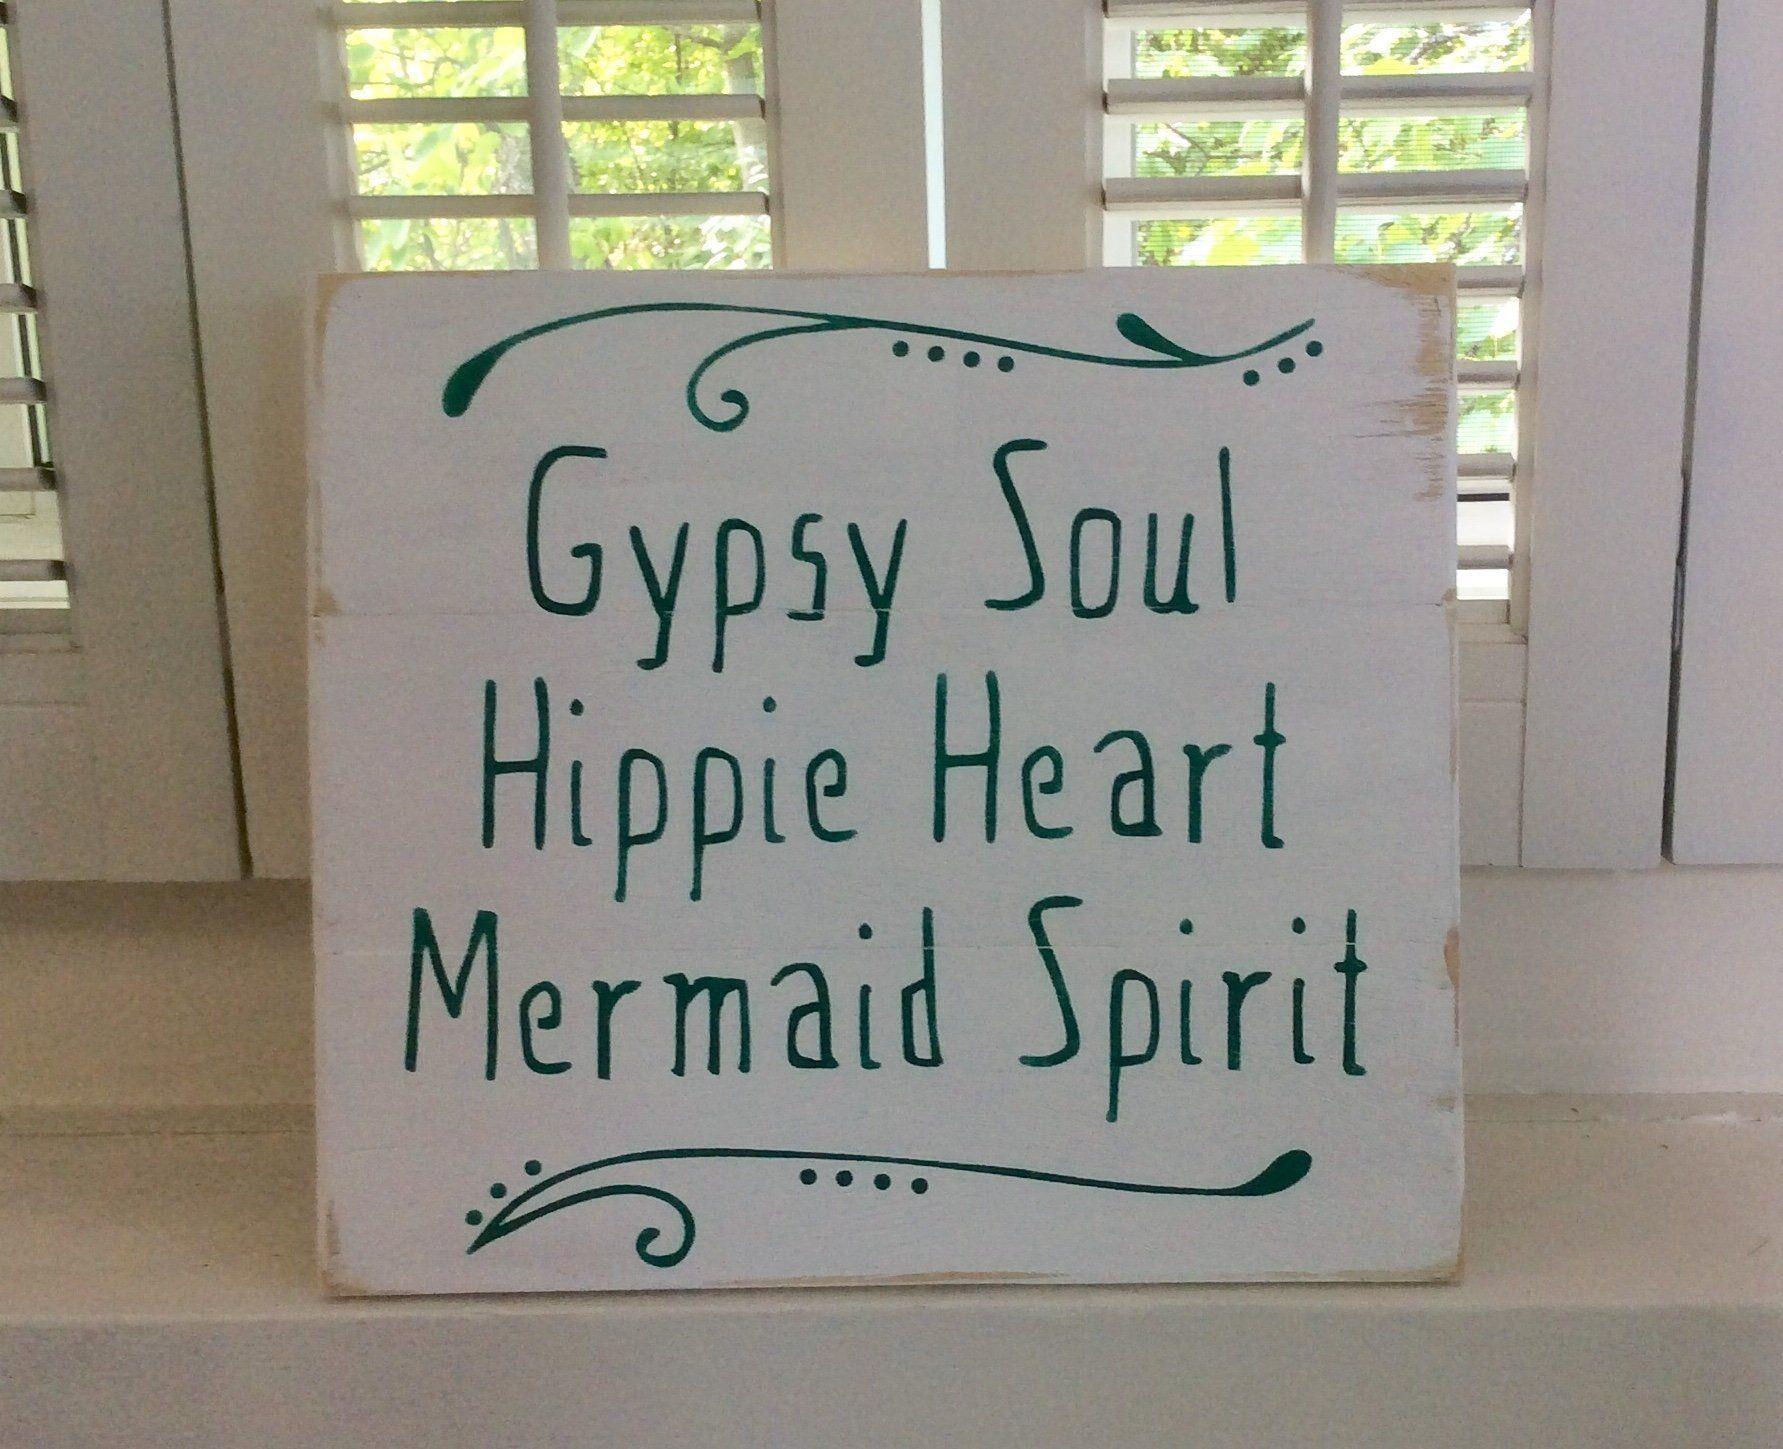 Gypsy Soul Hippie Heart Mermaid Spirit wood sign, mermaid sign, Gypsy sign, Hippie sign, BoHo decor #mermaidsign Gypsy Soul Hippie Heart Mermaid Spirit wood sign, mermaid sign, Gypsy sign, Hippie sign, BoHo decor by Rusticpalletshop1 on Etsy #mermaidsign